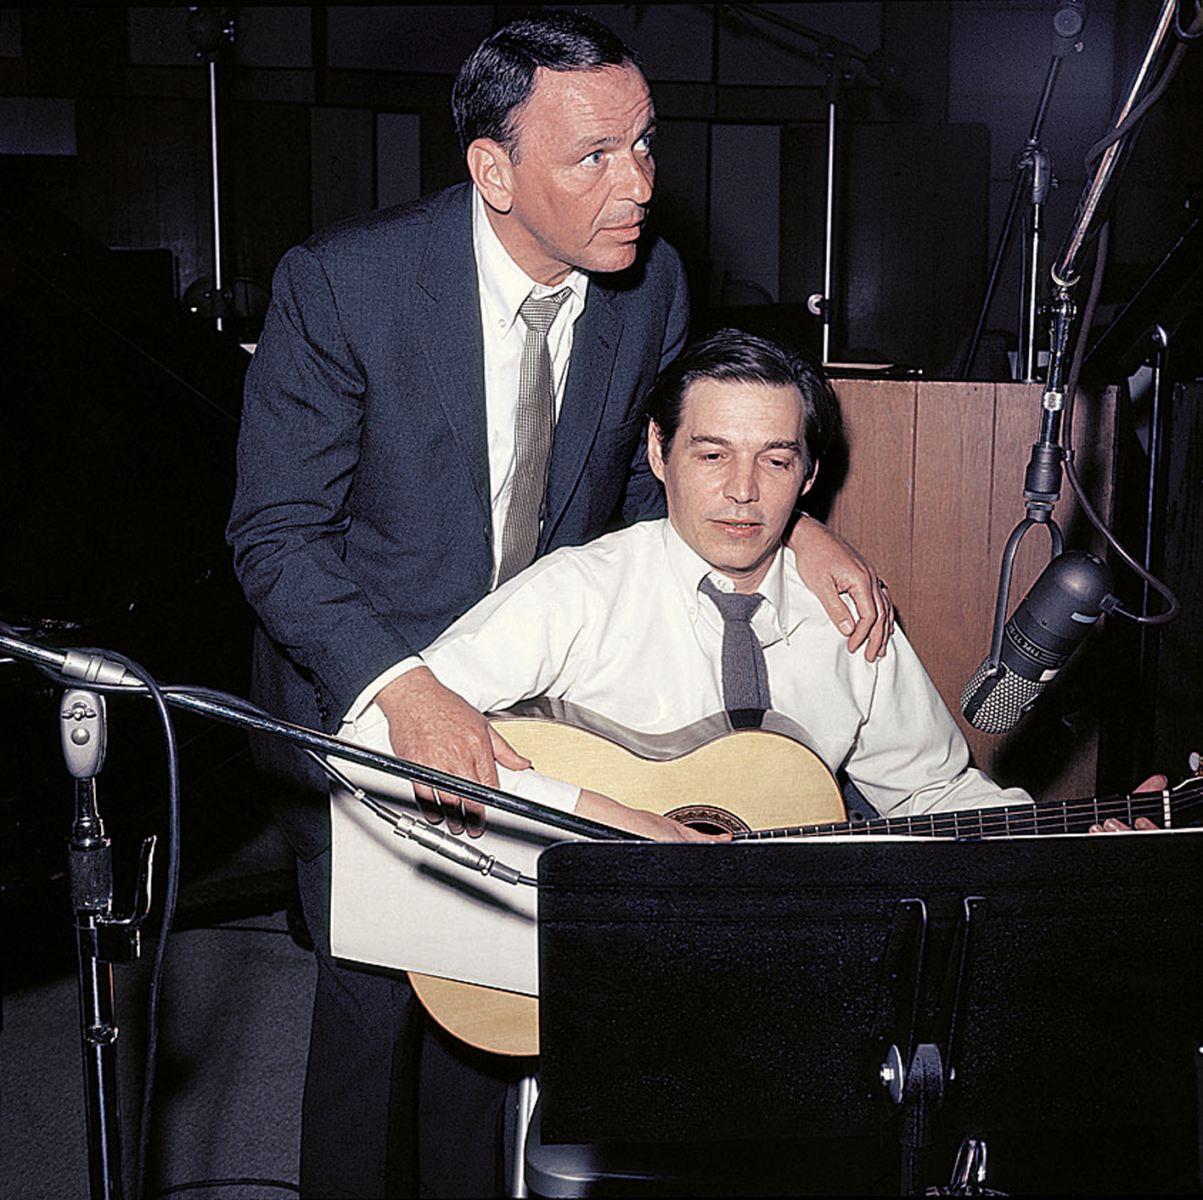 http://www.indeepmusicarchive.net/wp-content/uploads/2014/04/Jobim-Sinatra-studio-pic.jpg